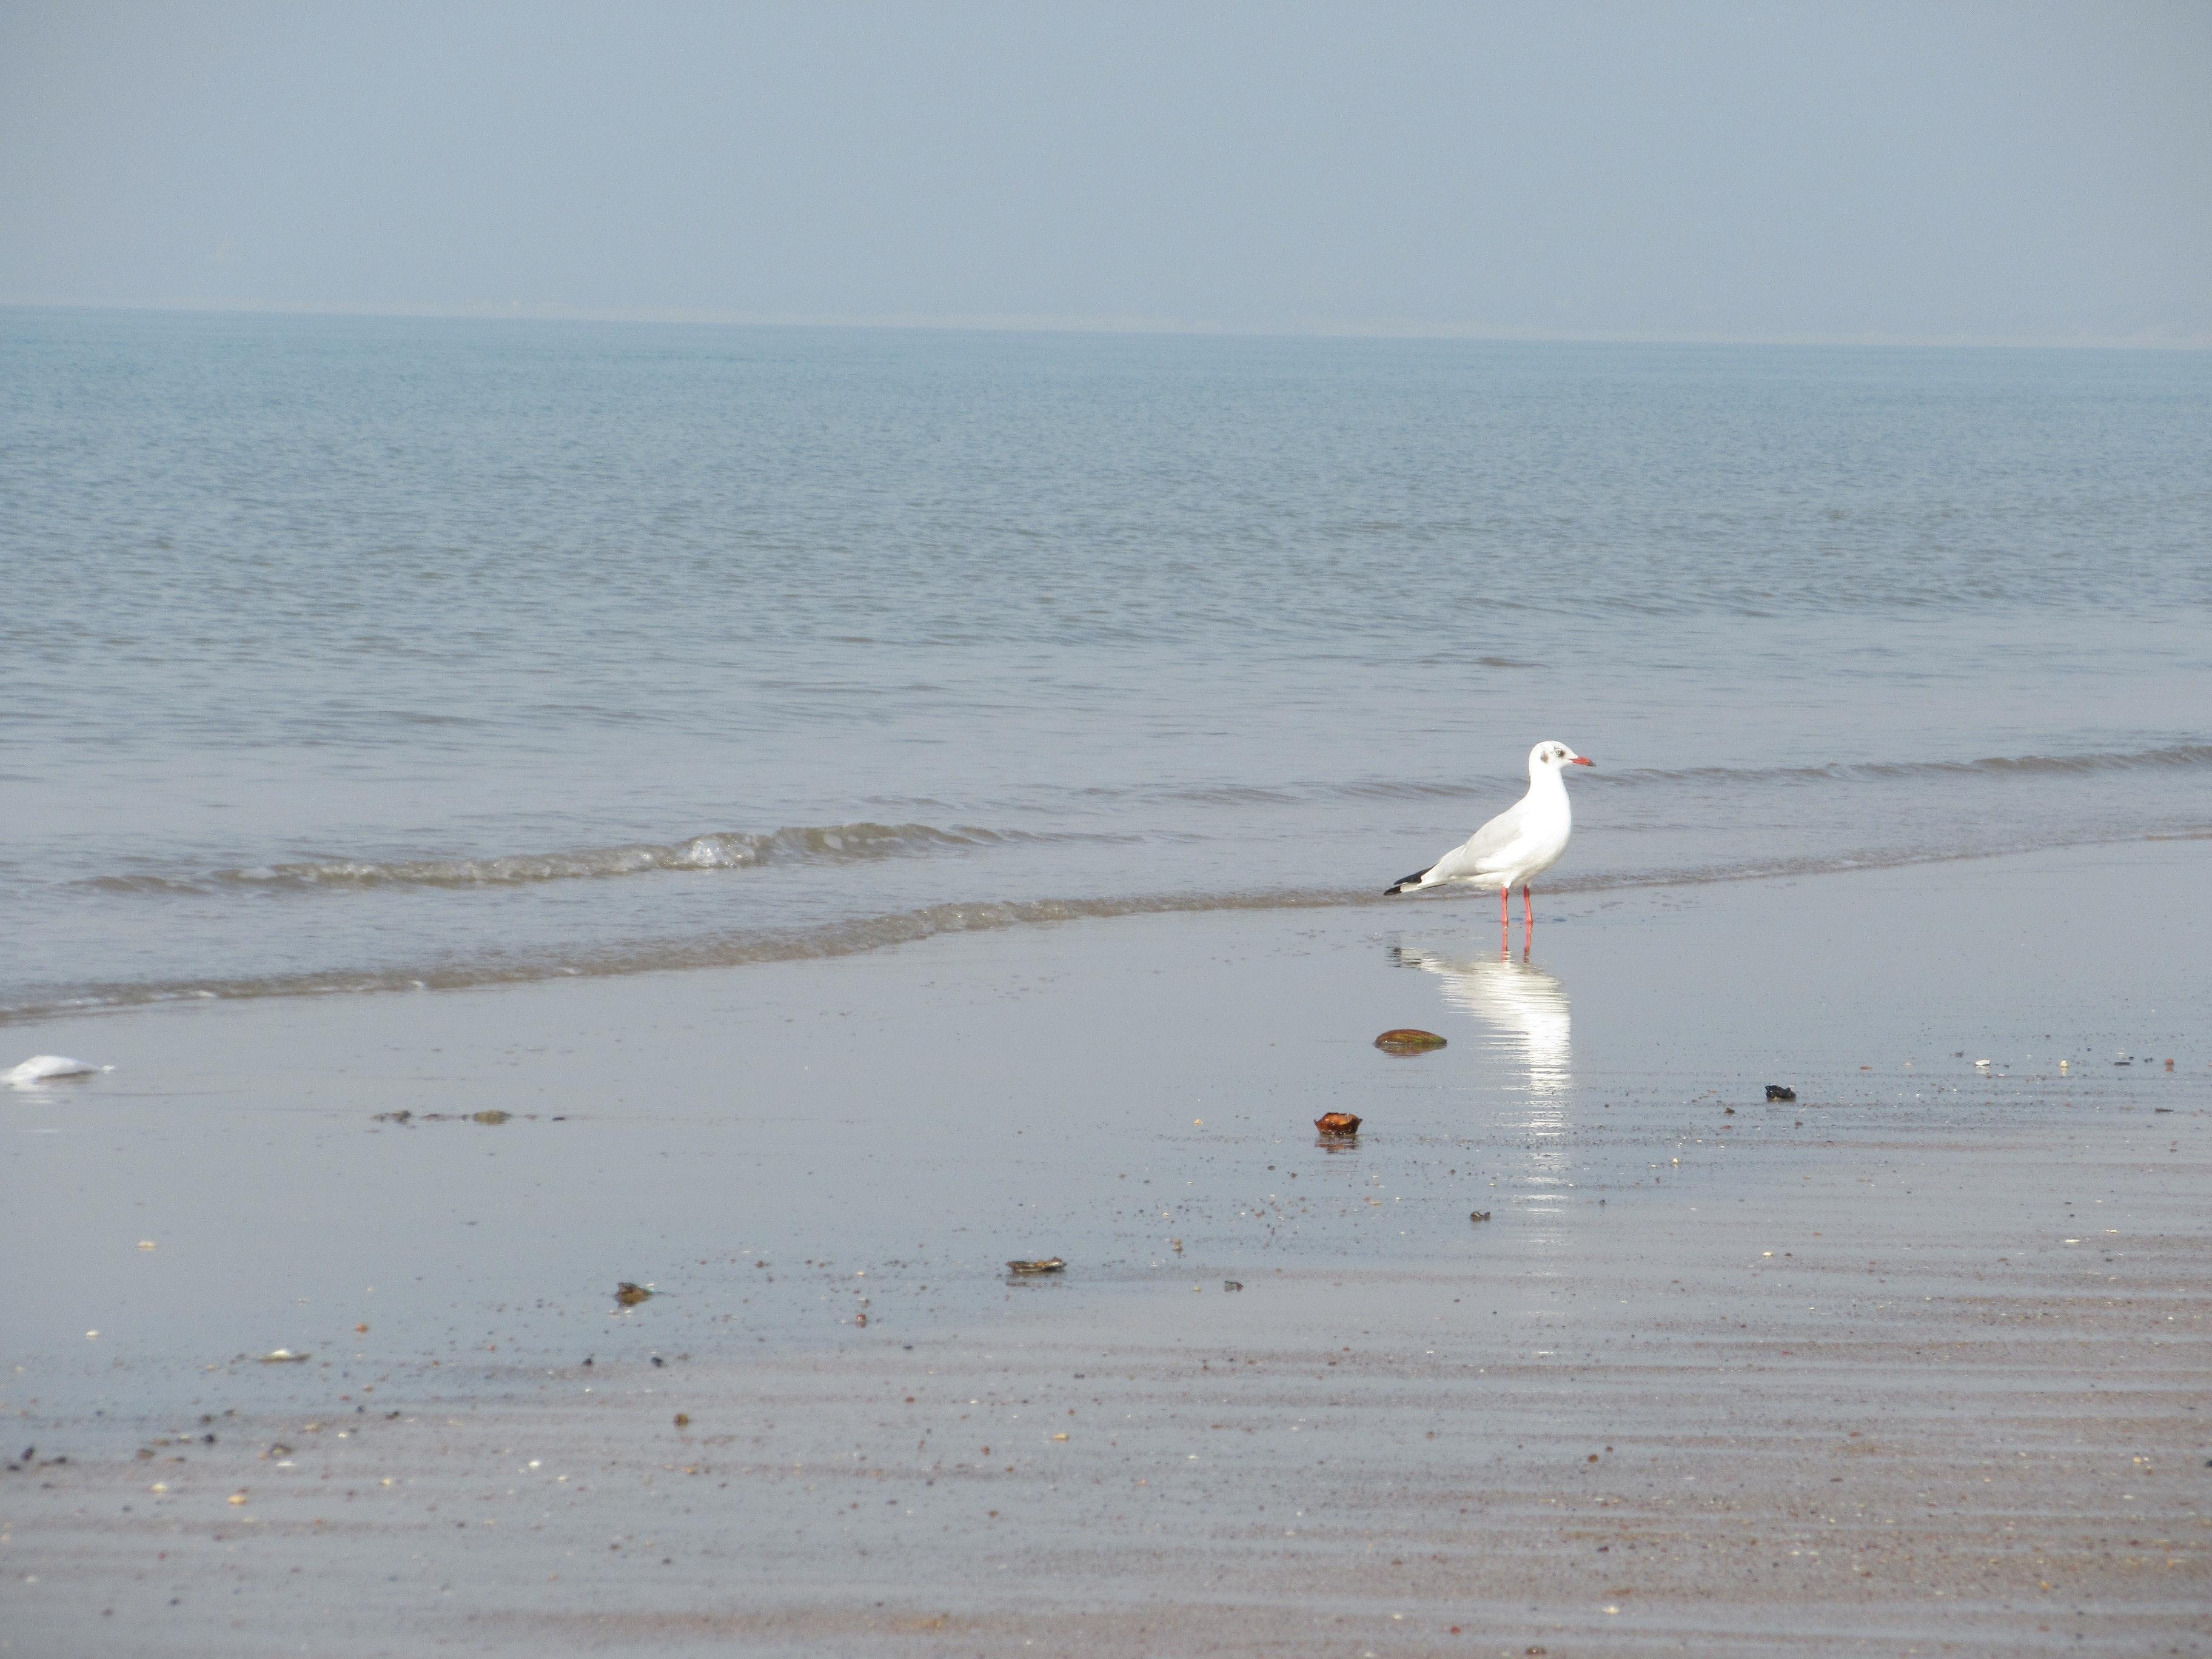 Free stock photo of bird, sea beach, seagull